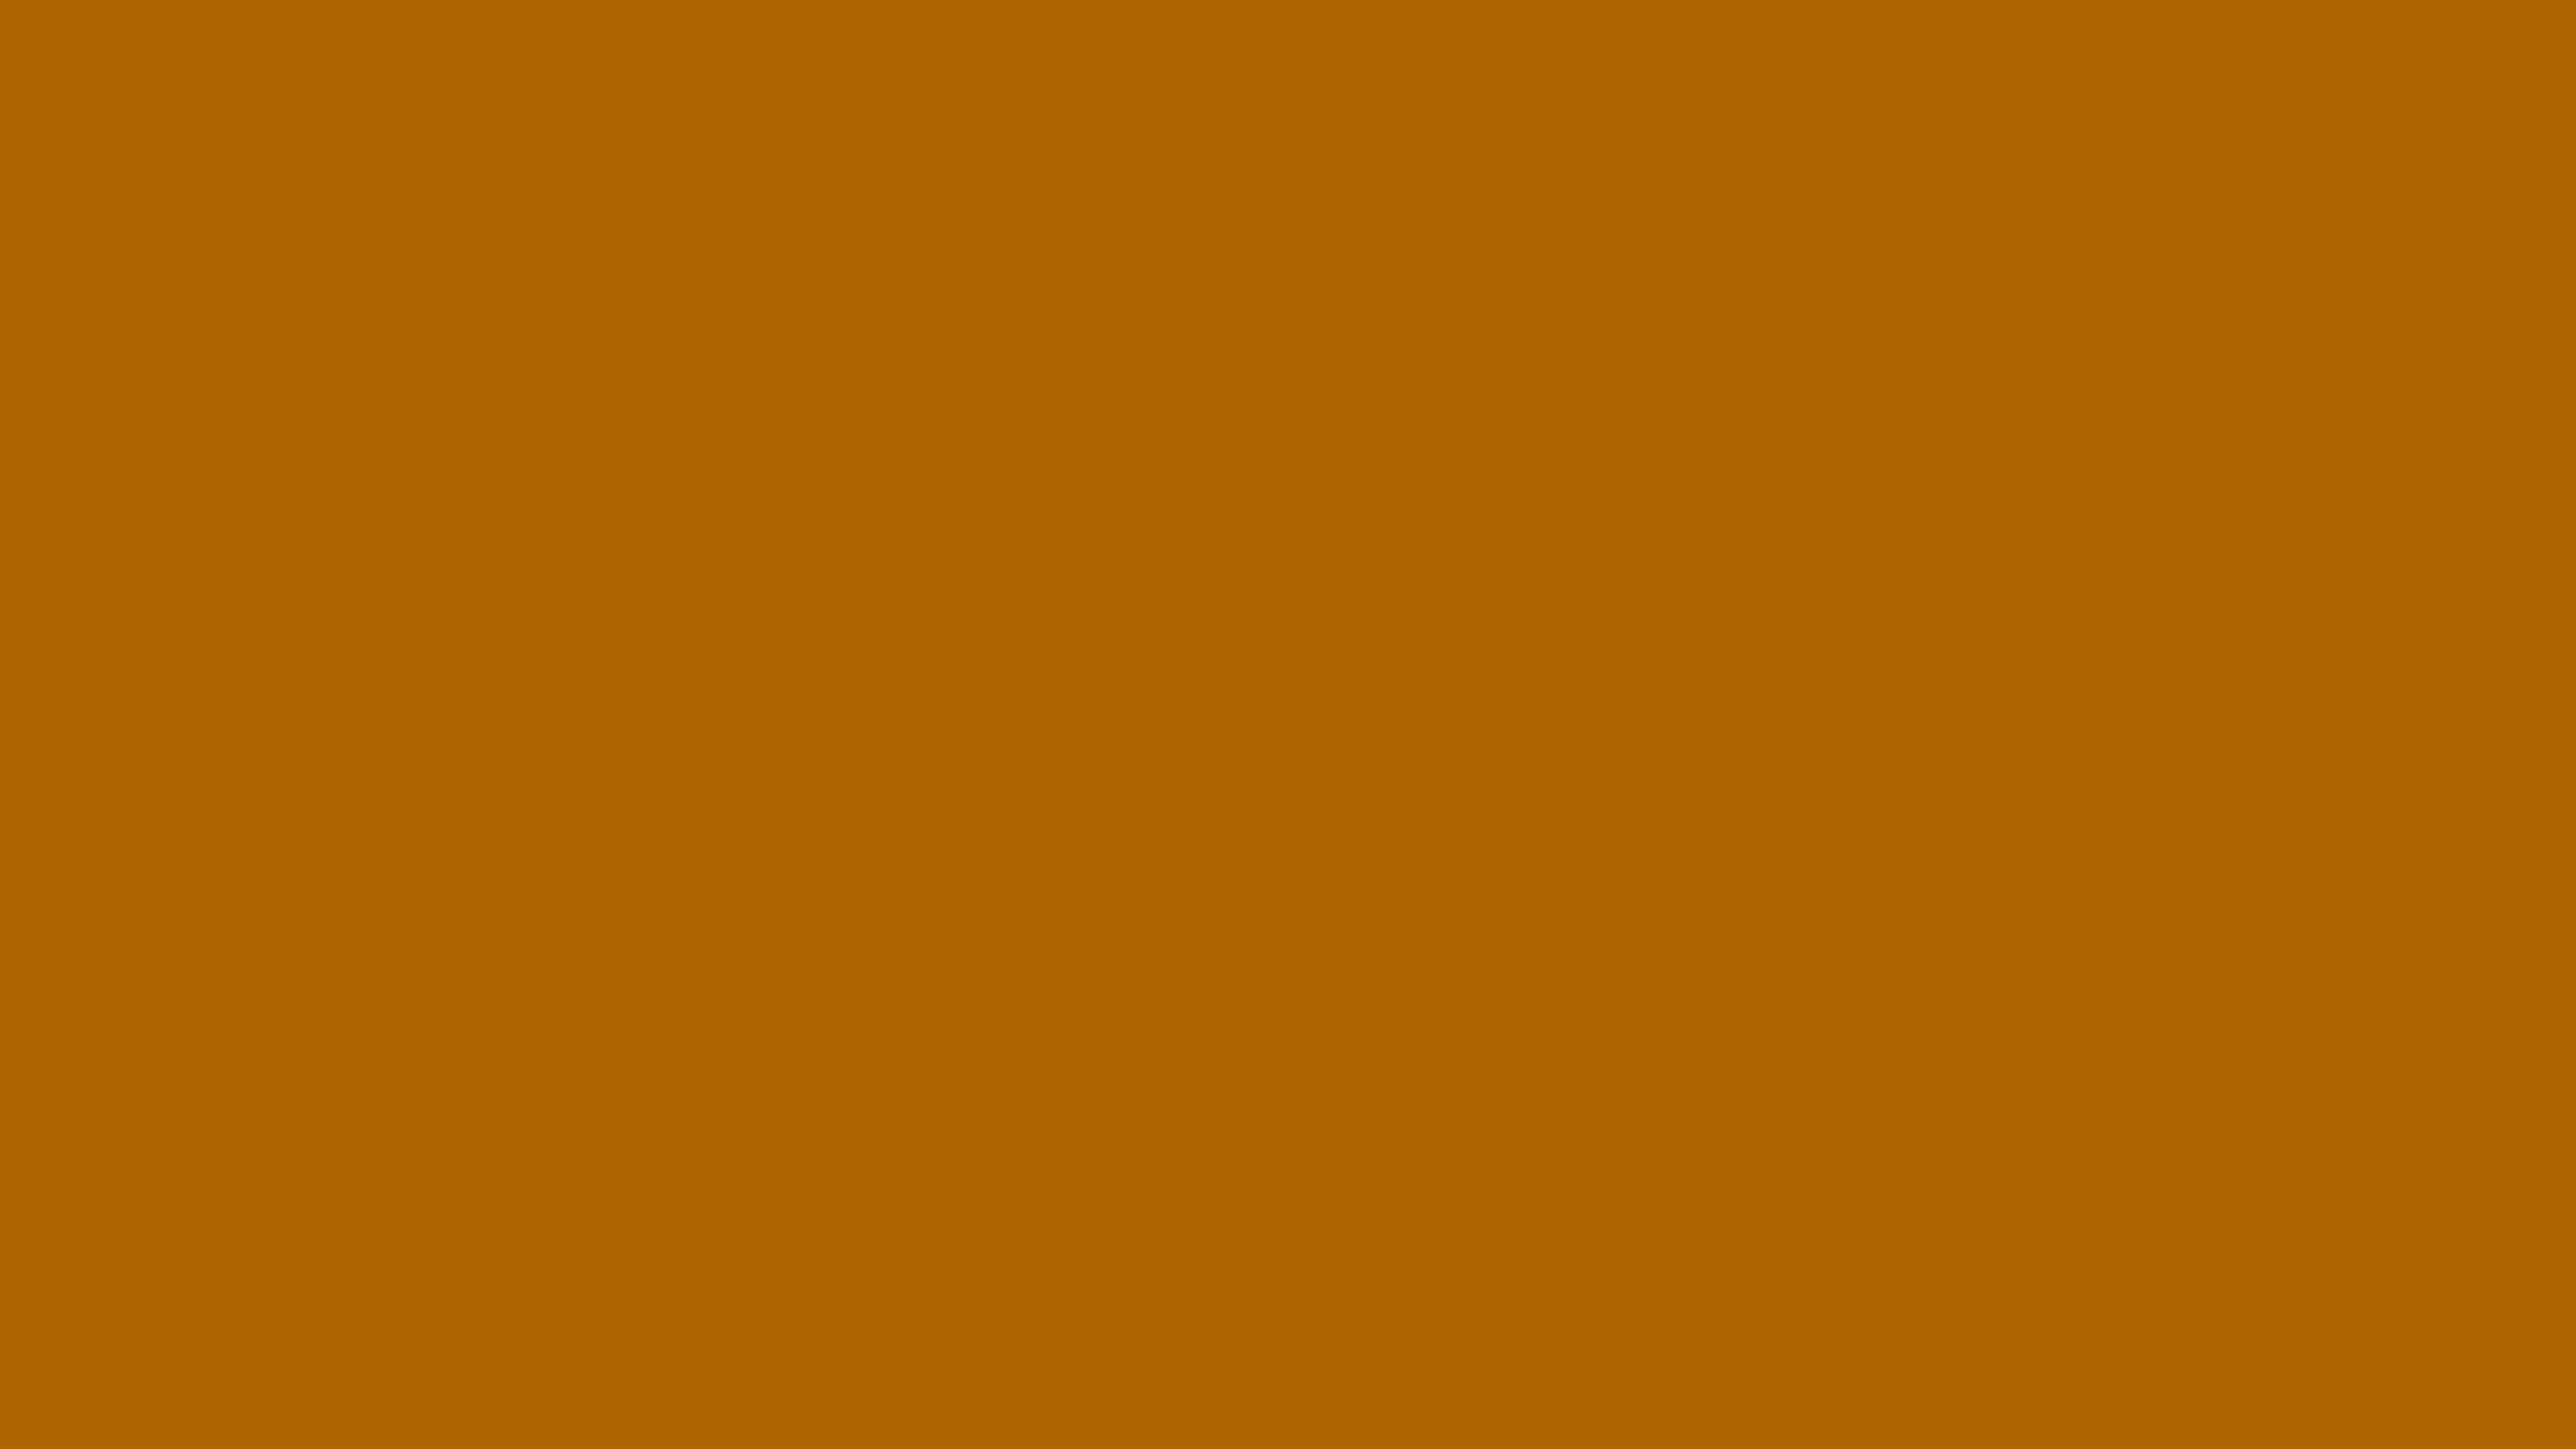 5120x2880 Ginger Solid Color Background